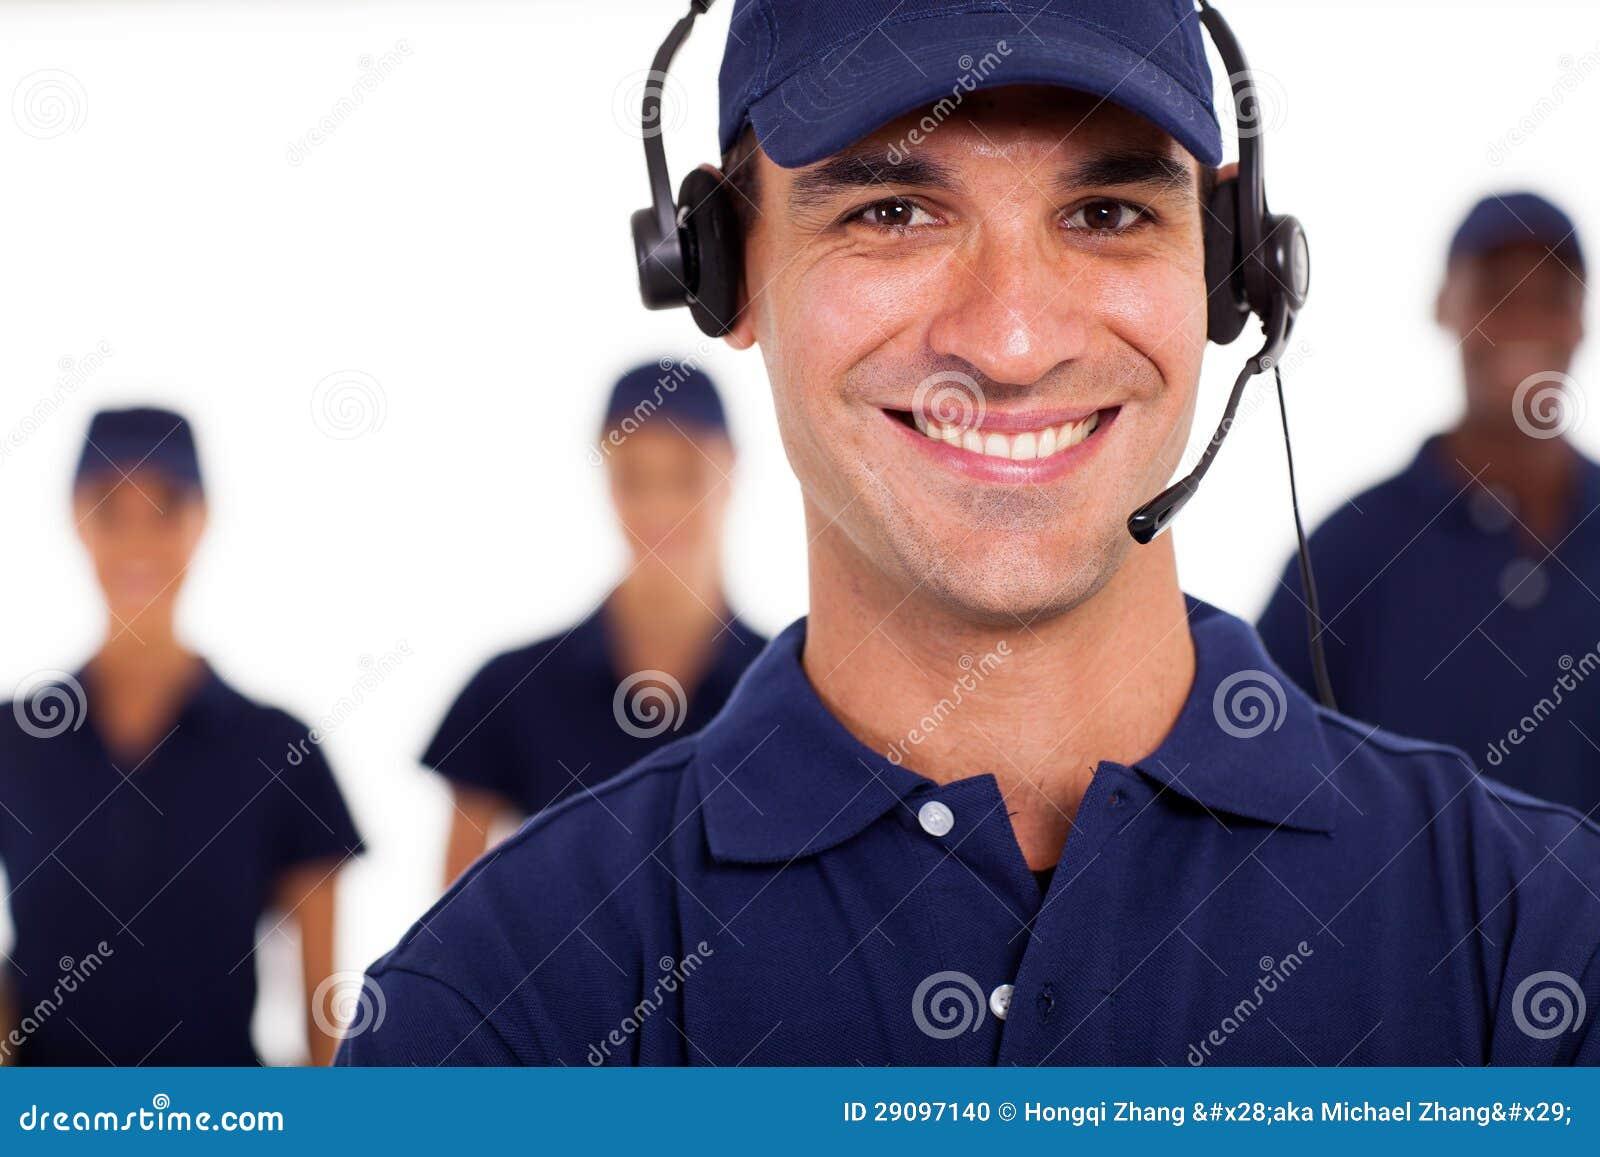 Professional IT technician